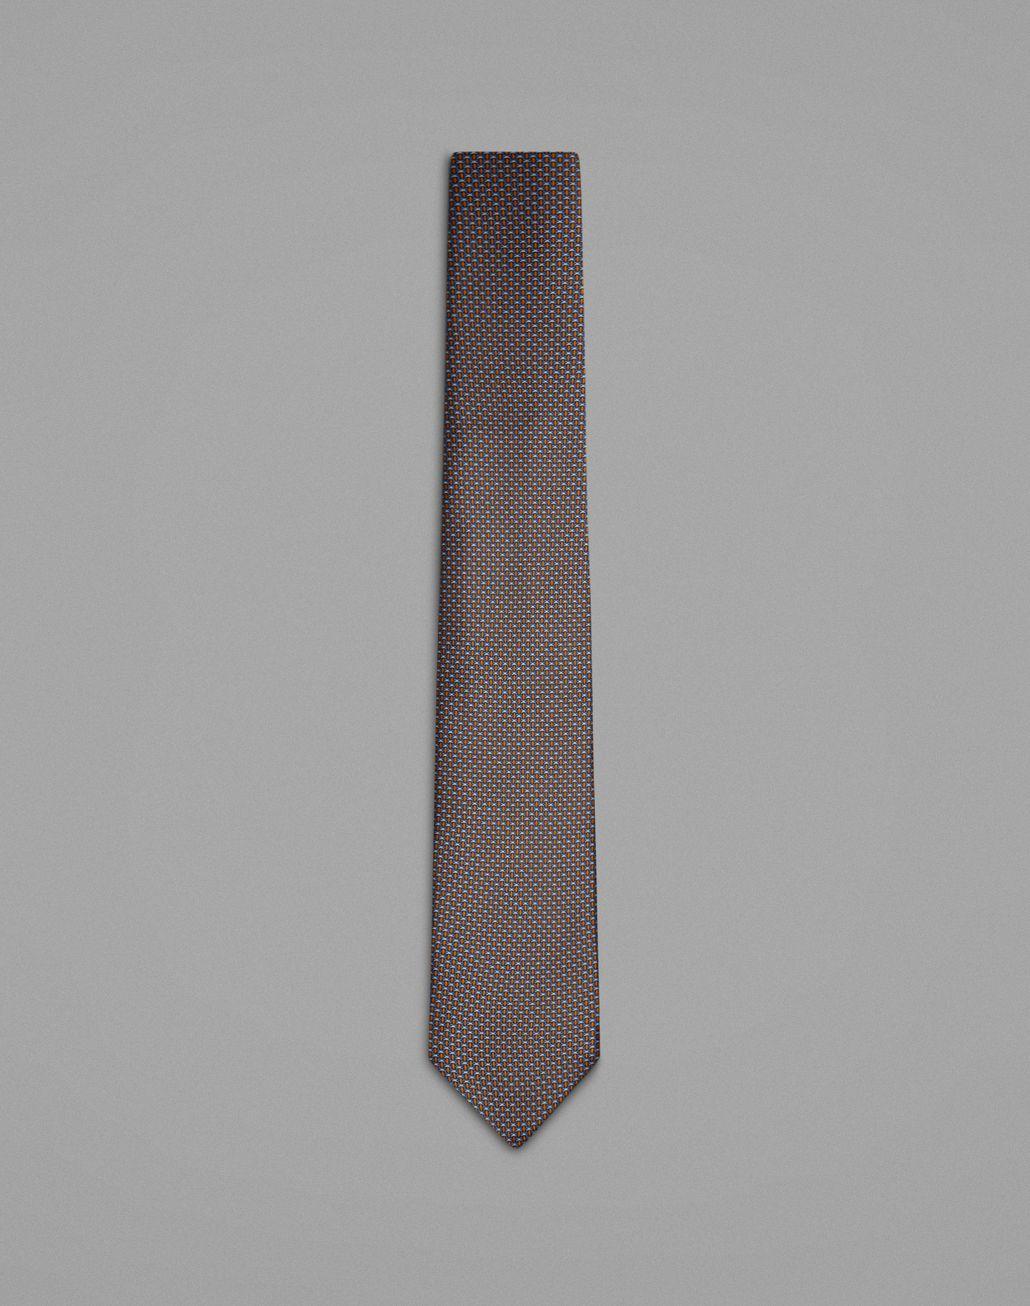 BRIONI Cravatta Grigia con Micro-Fantasia Cravatta Uomo f